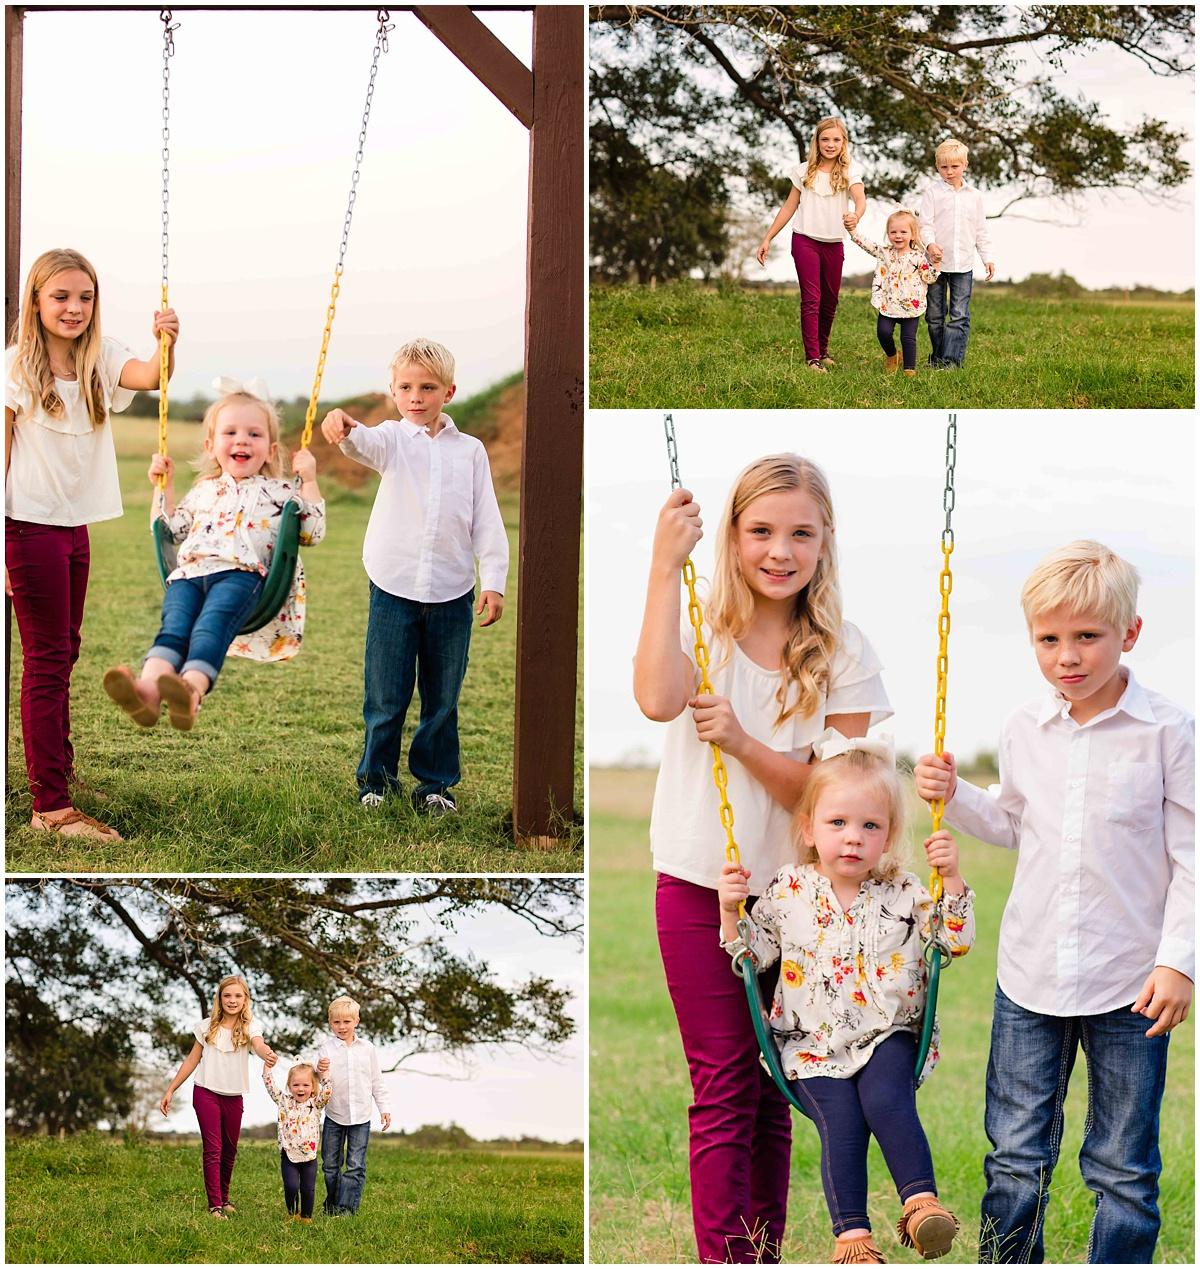 Family-Children-Maternity-Portraits-San-Antonio-Hill-Country-Texas-Carly-Barton-Photography_0029.jpg